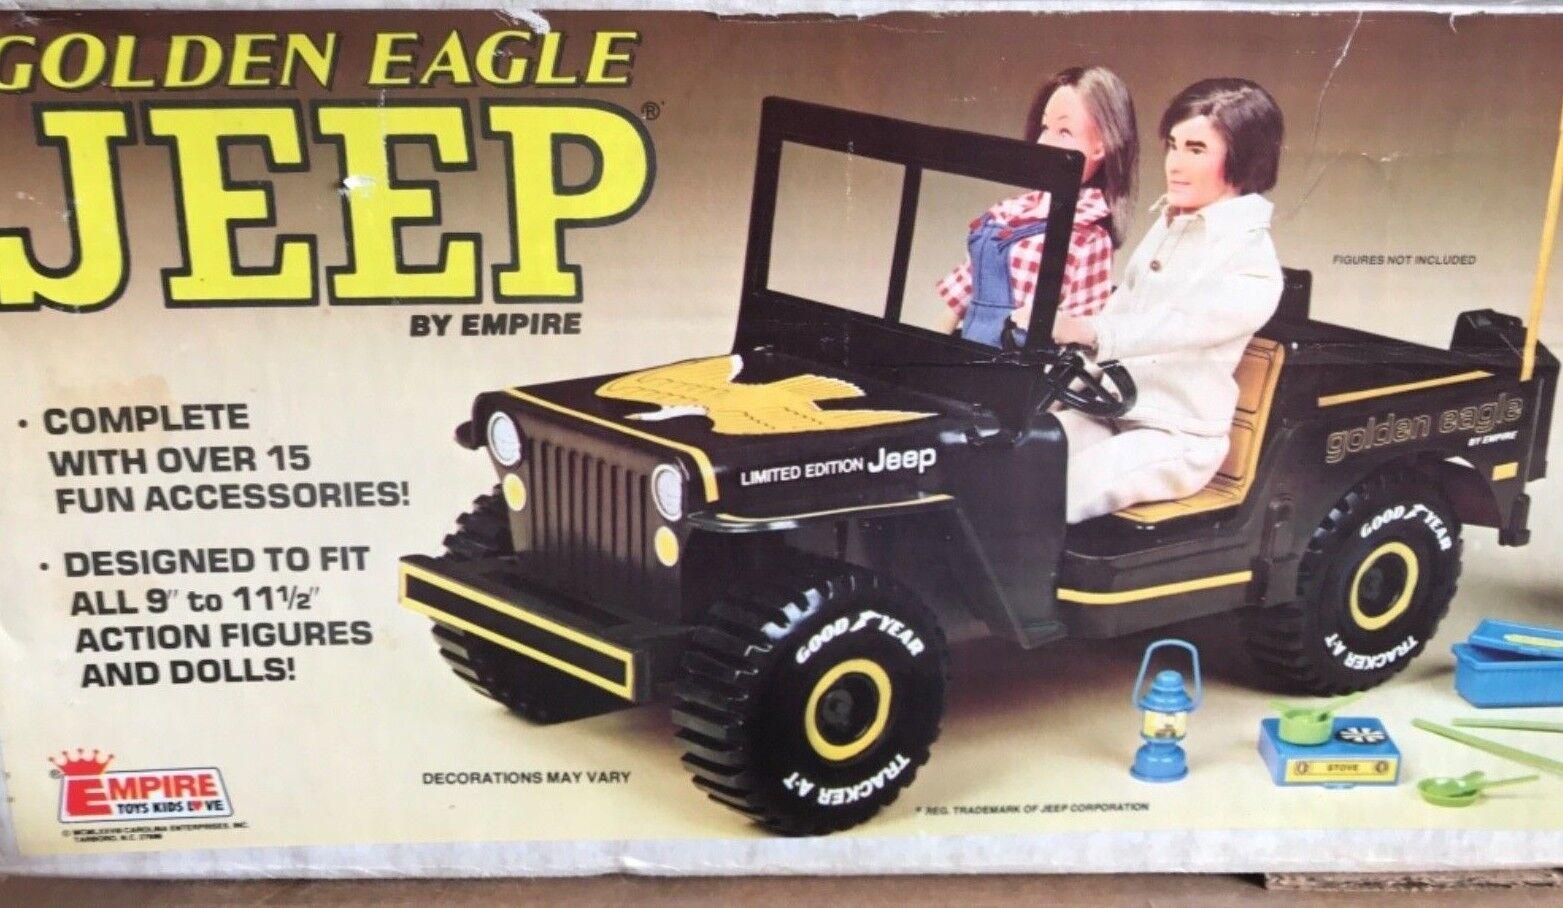 Vintage Plastic Jeep golden Eagle Empire Toys For 1 6 Figures MIB 1978